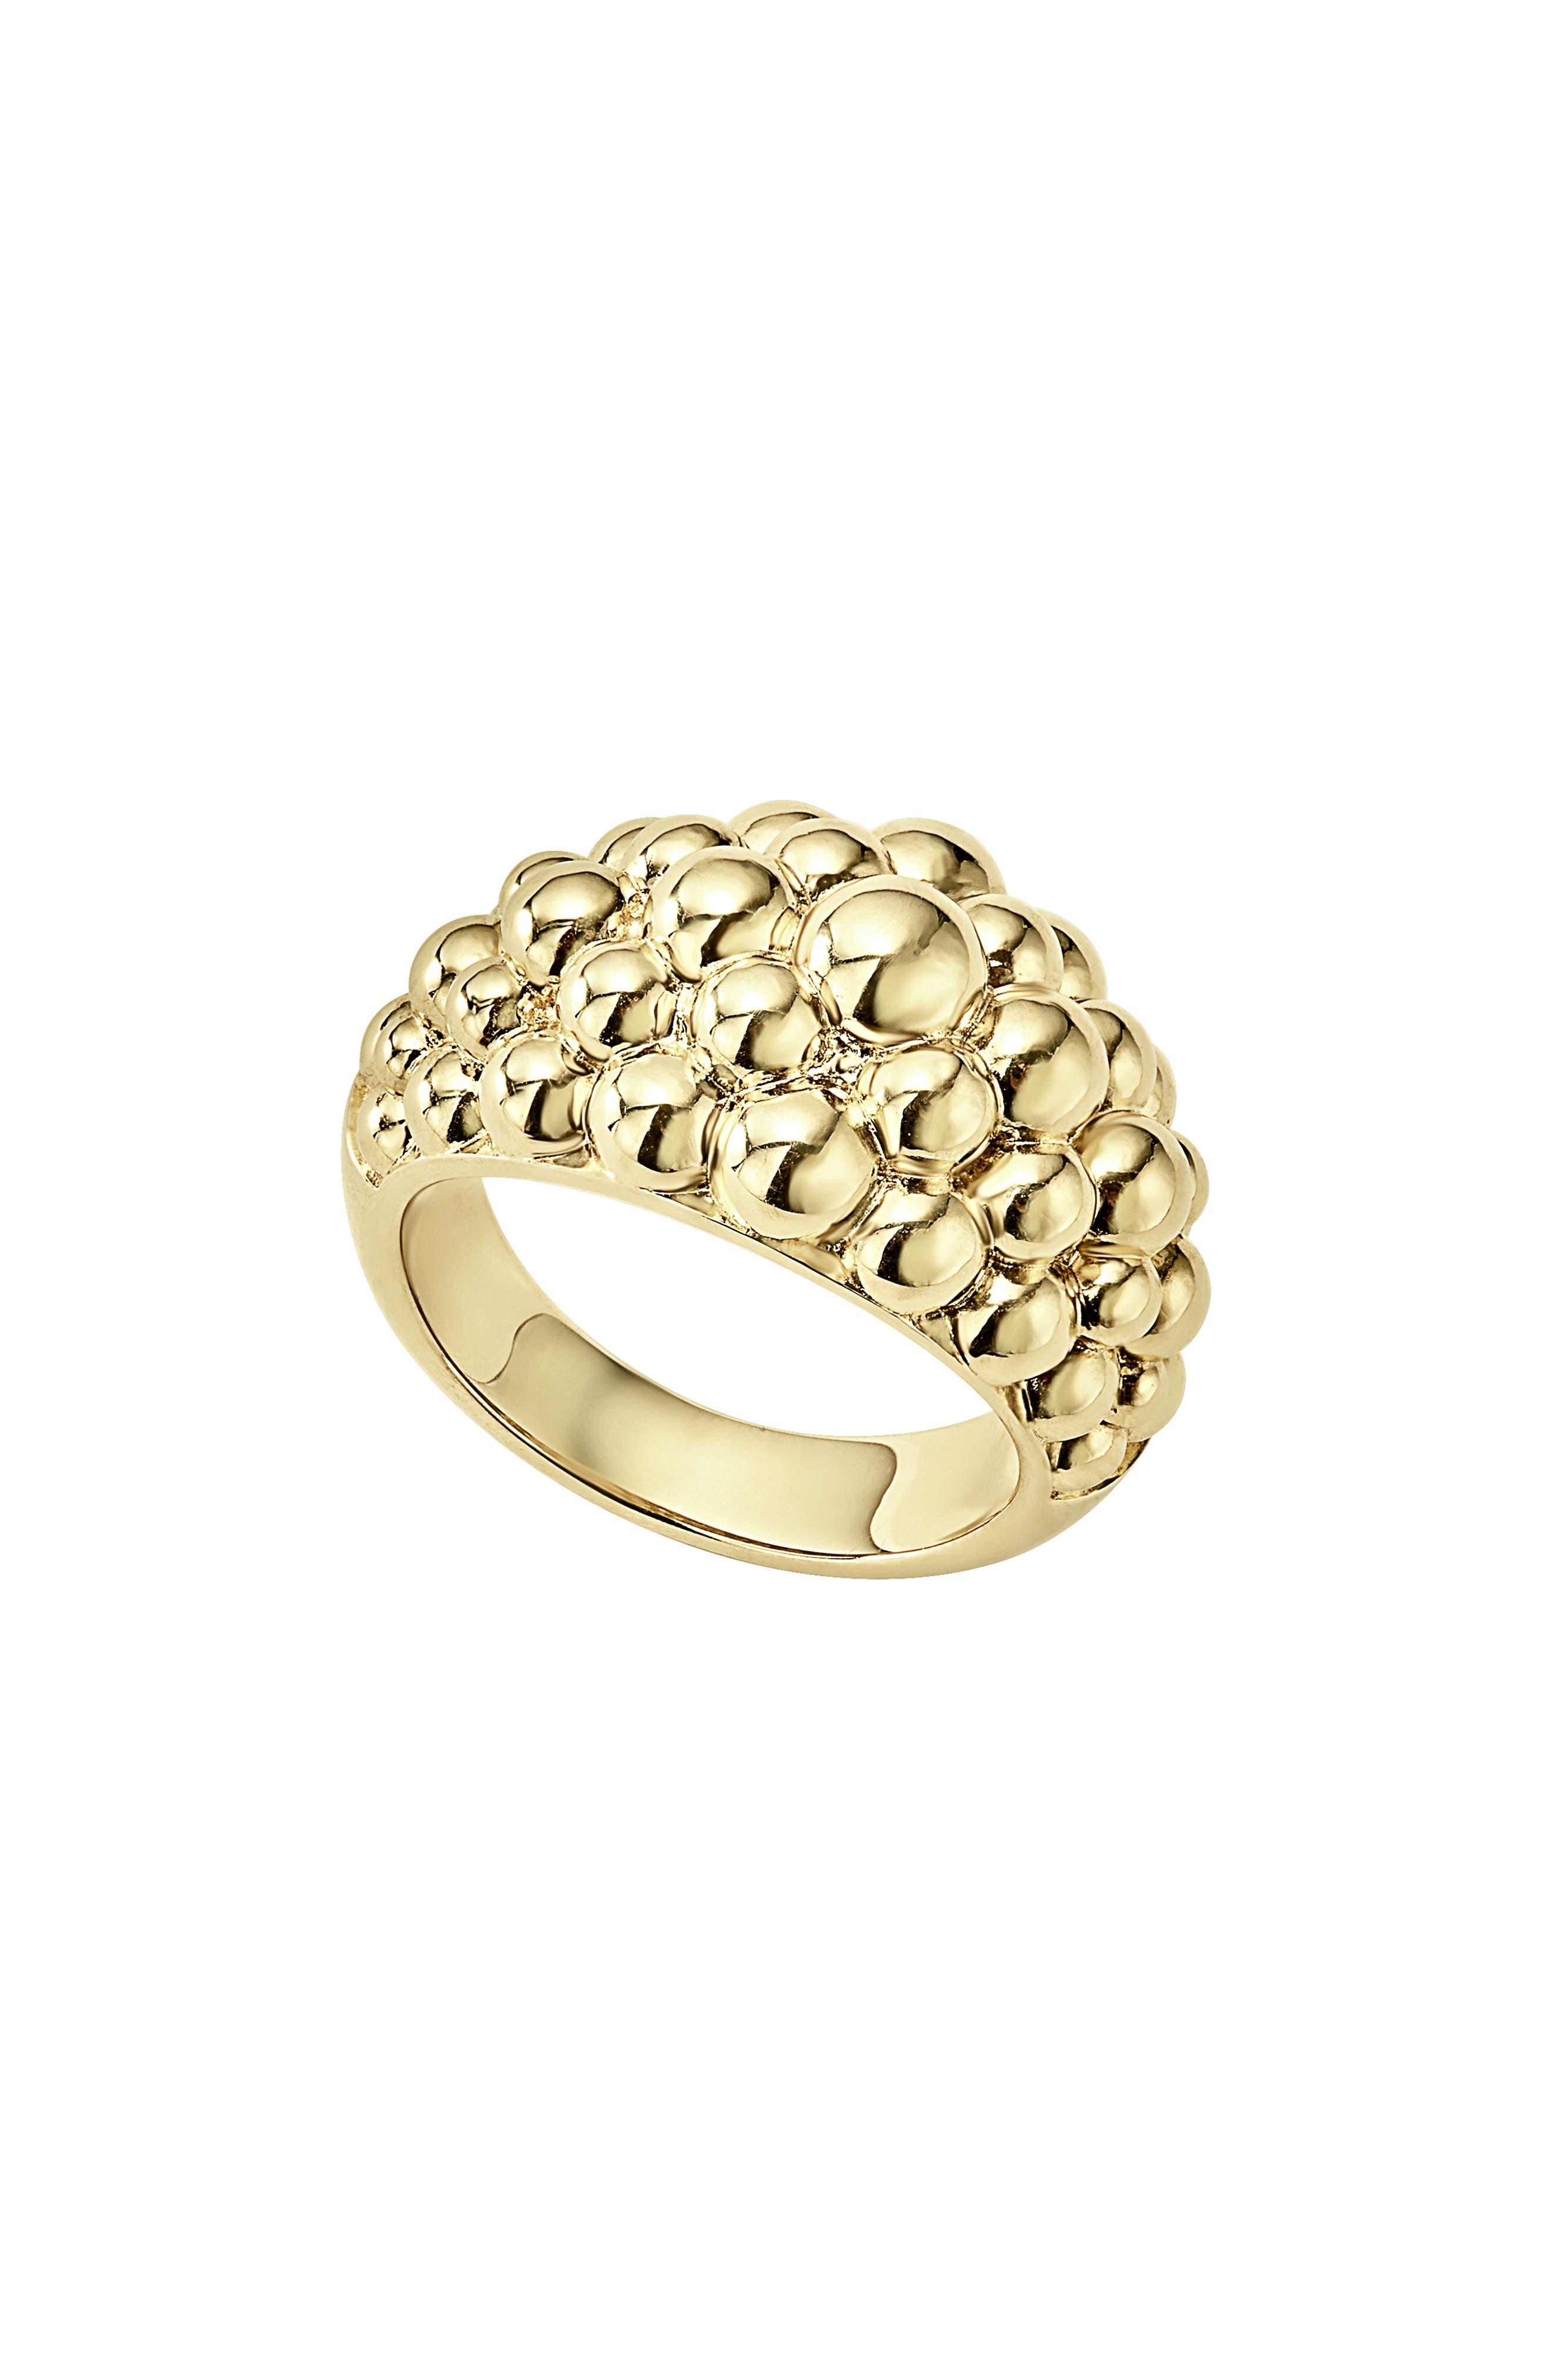 LAGOS Caviar Gold Bold Dome Ring, Main, color, GOLD